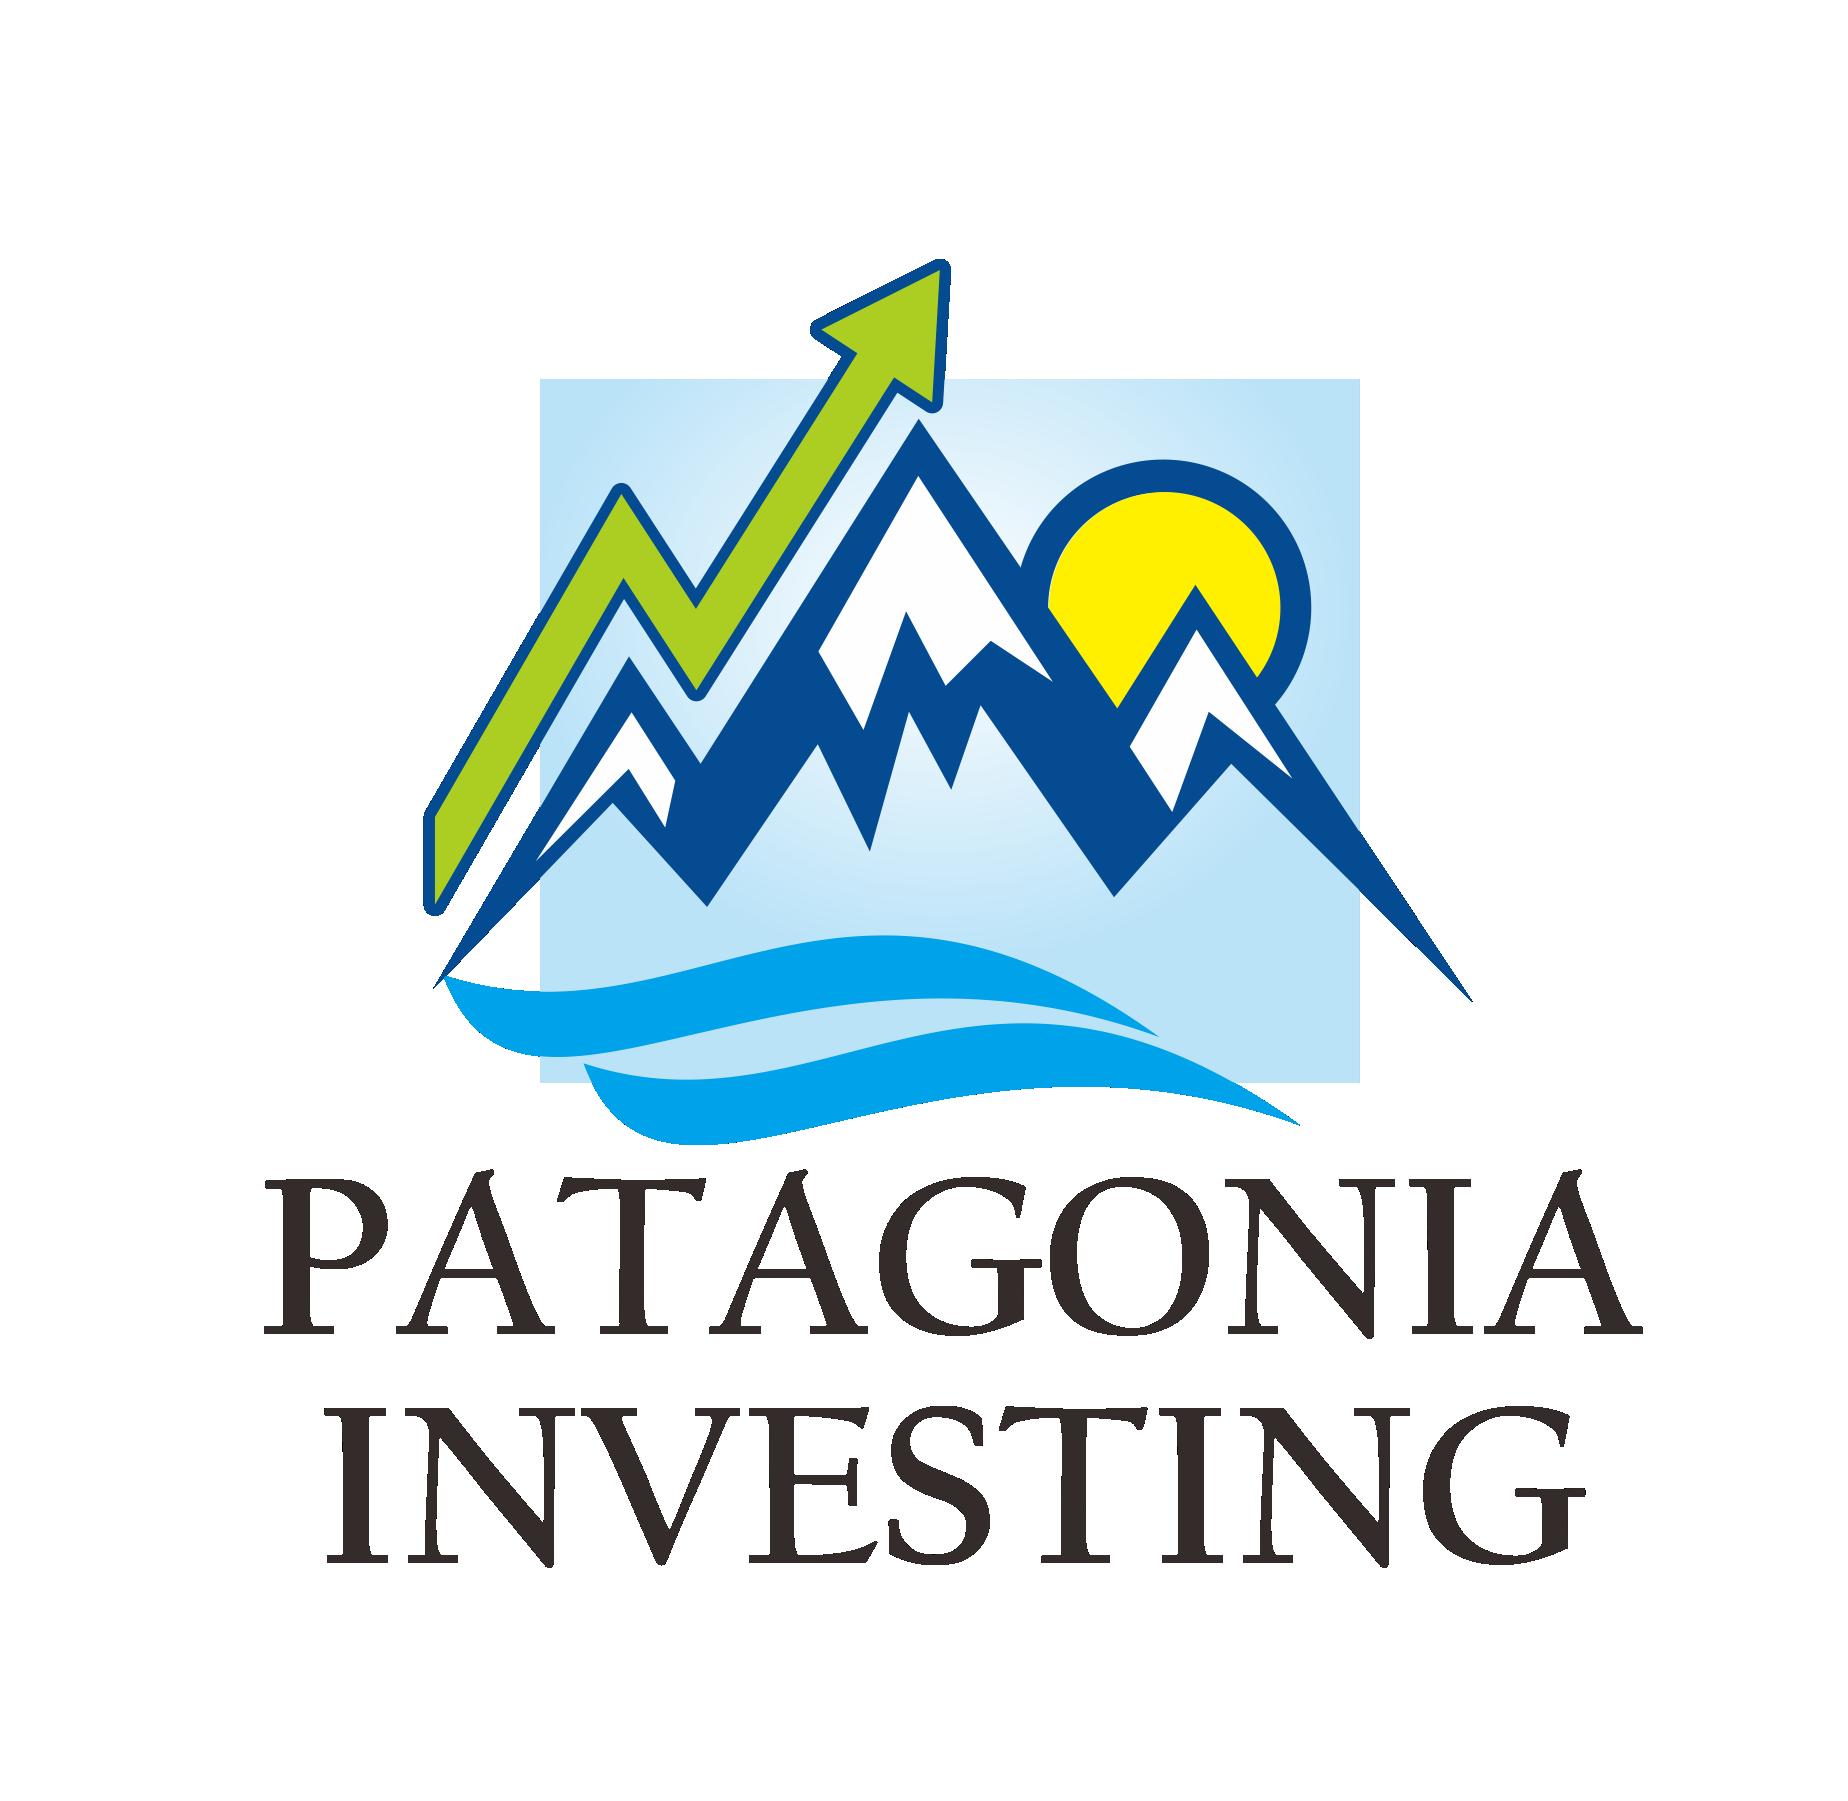 Patagonia Investing